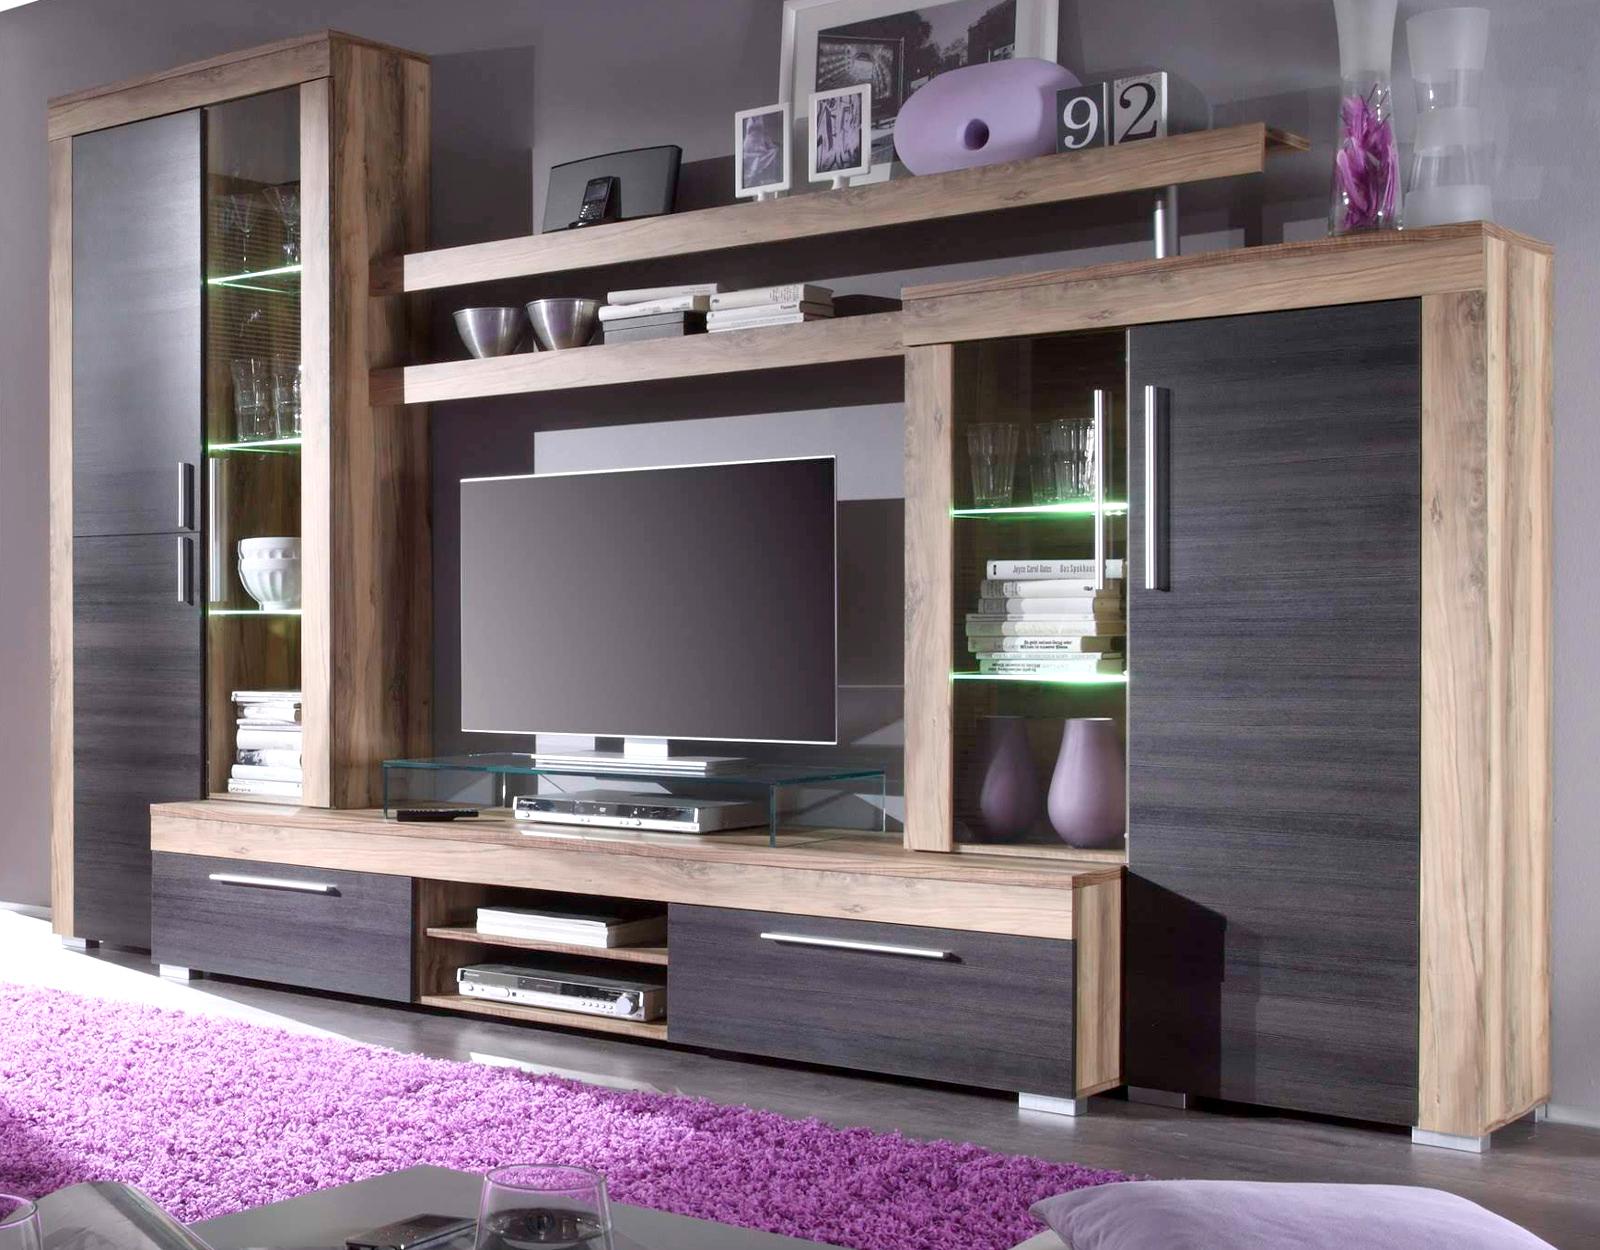 Wohnzimmer: Wohnwand \